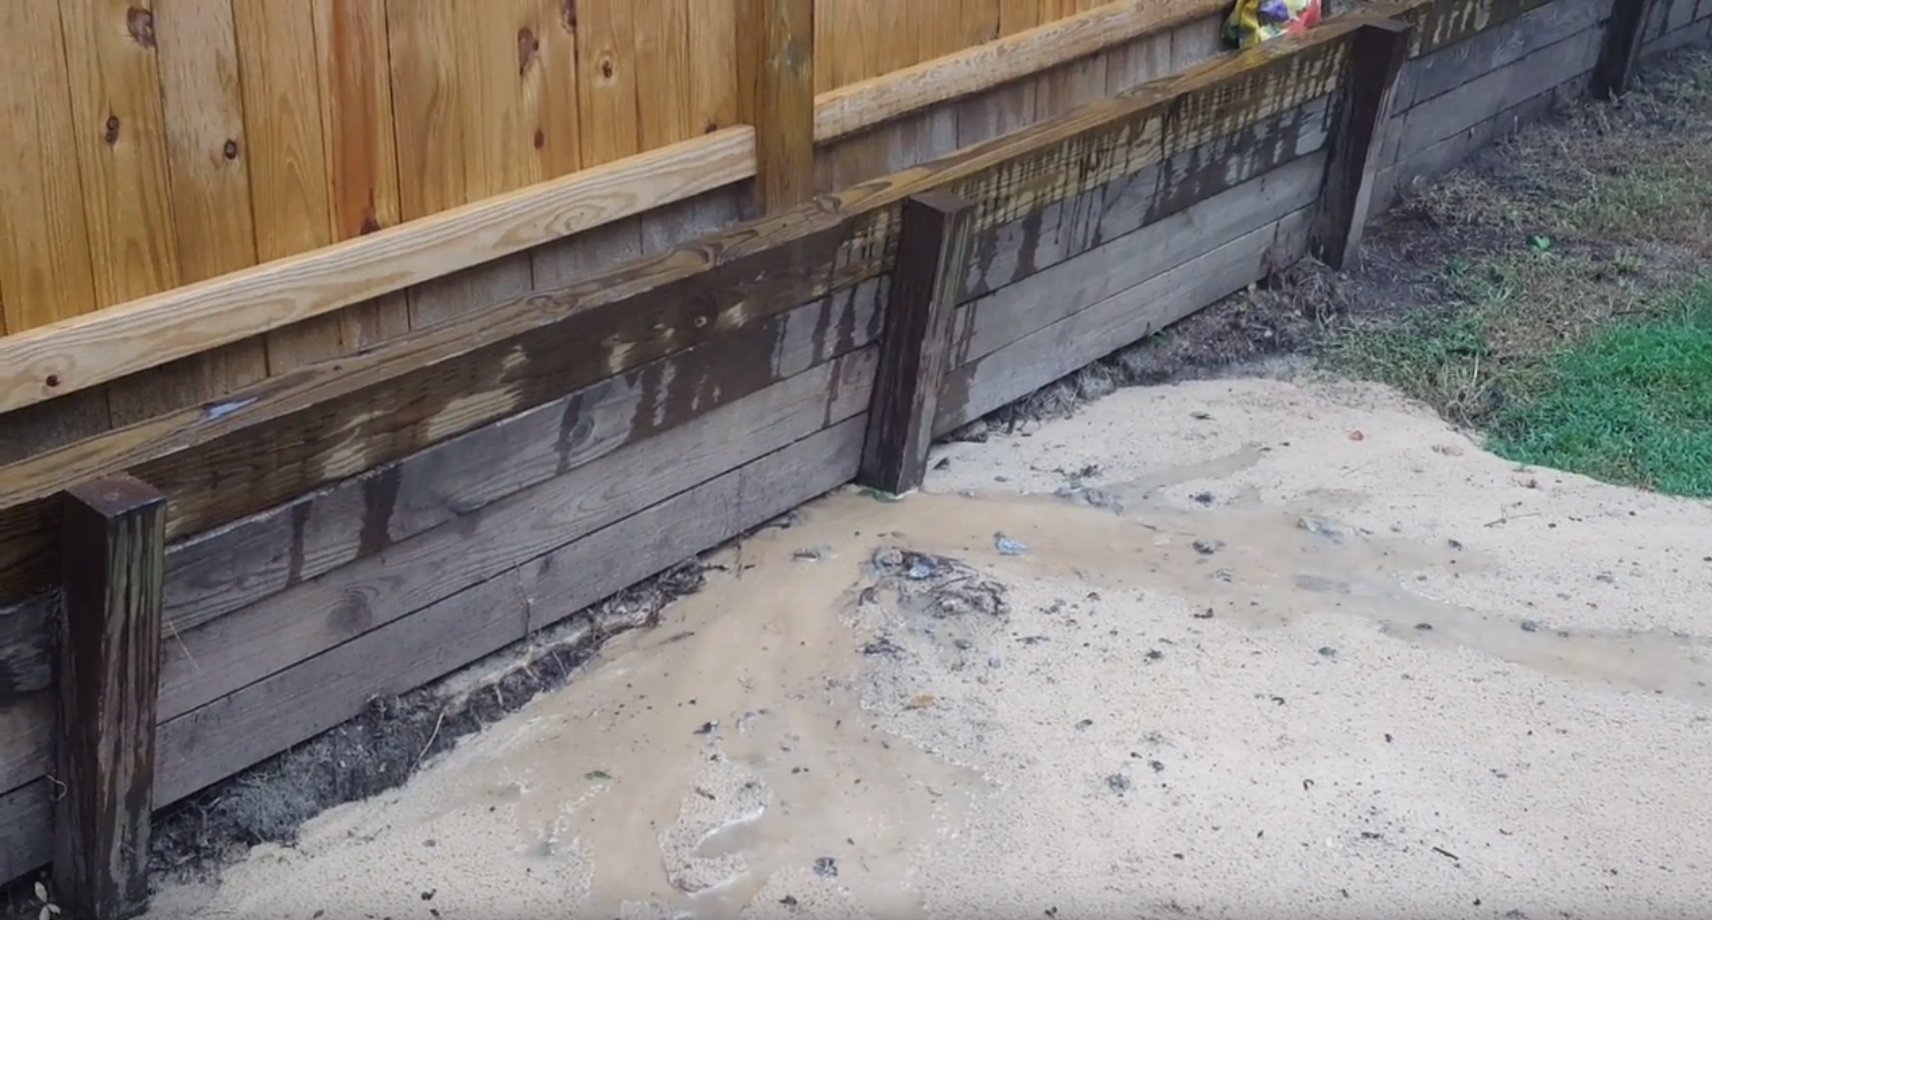 Timber retaining wall repair help-wallleak.png